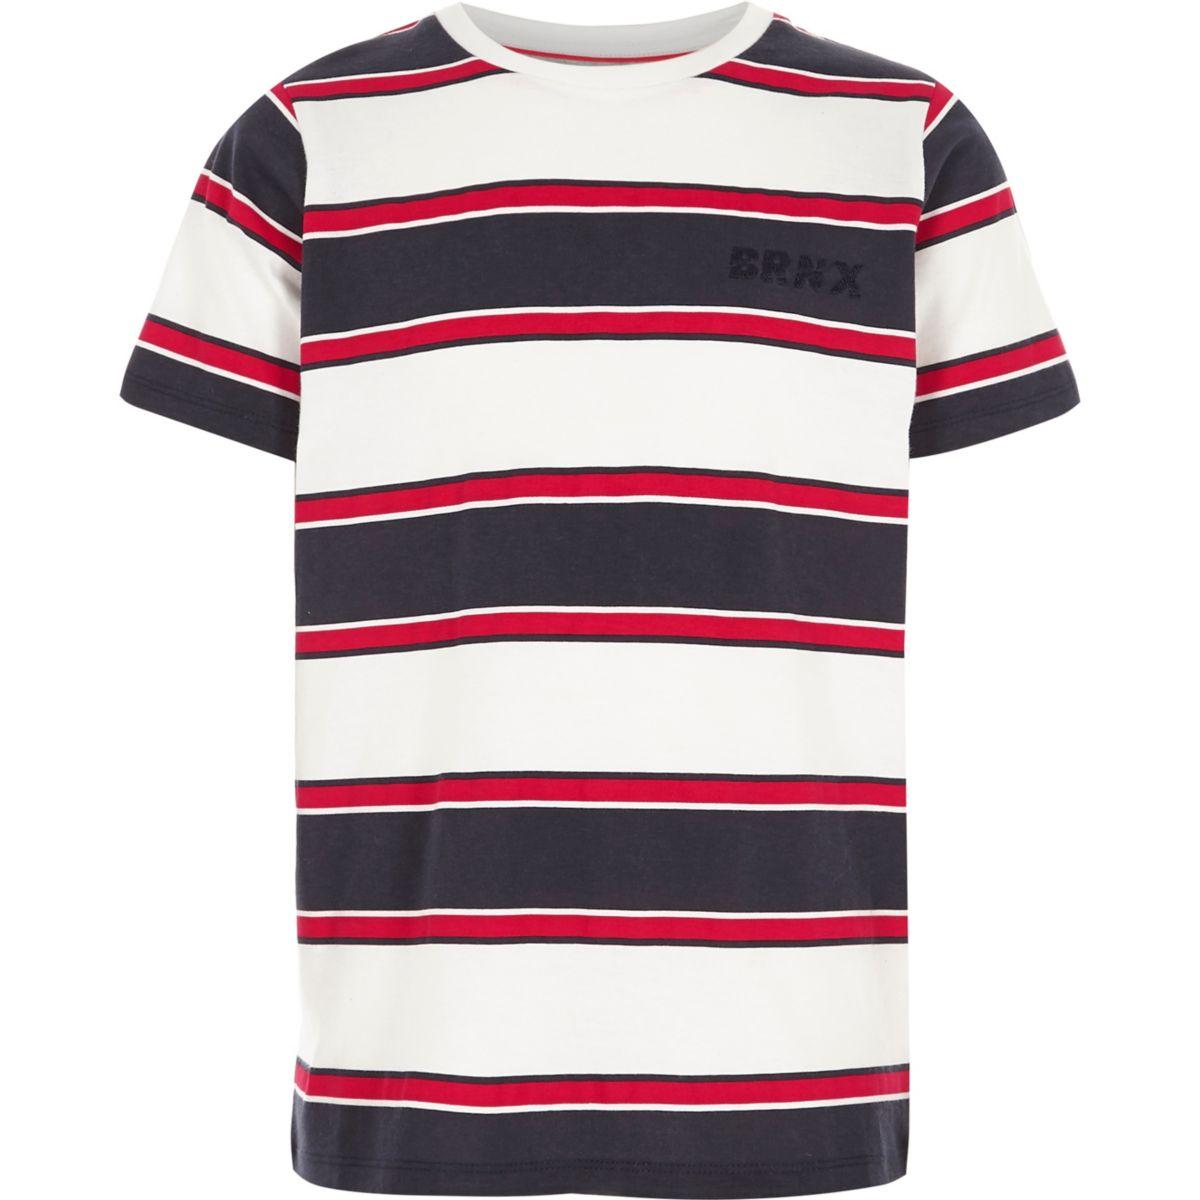 Boys red stripe 'brnx' embroidered T-shirt